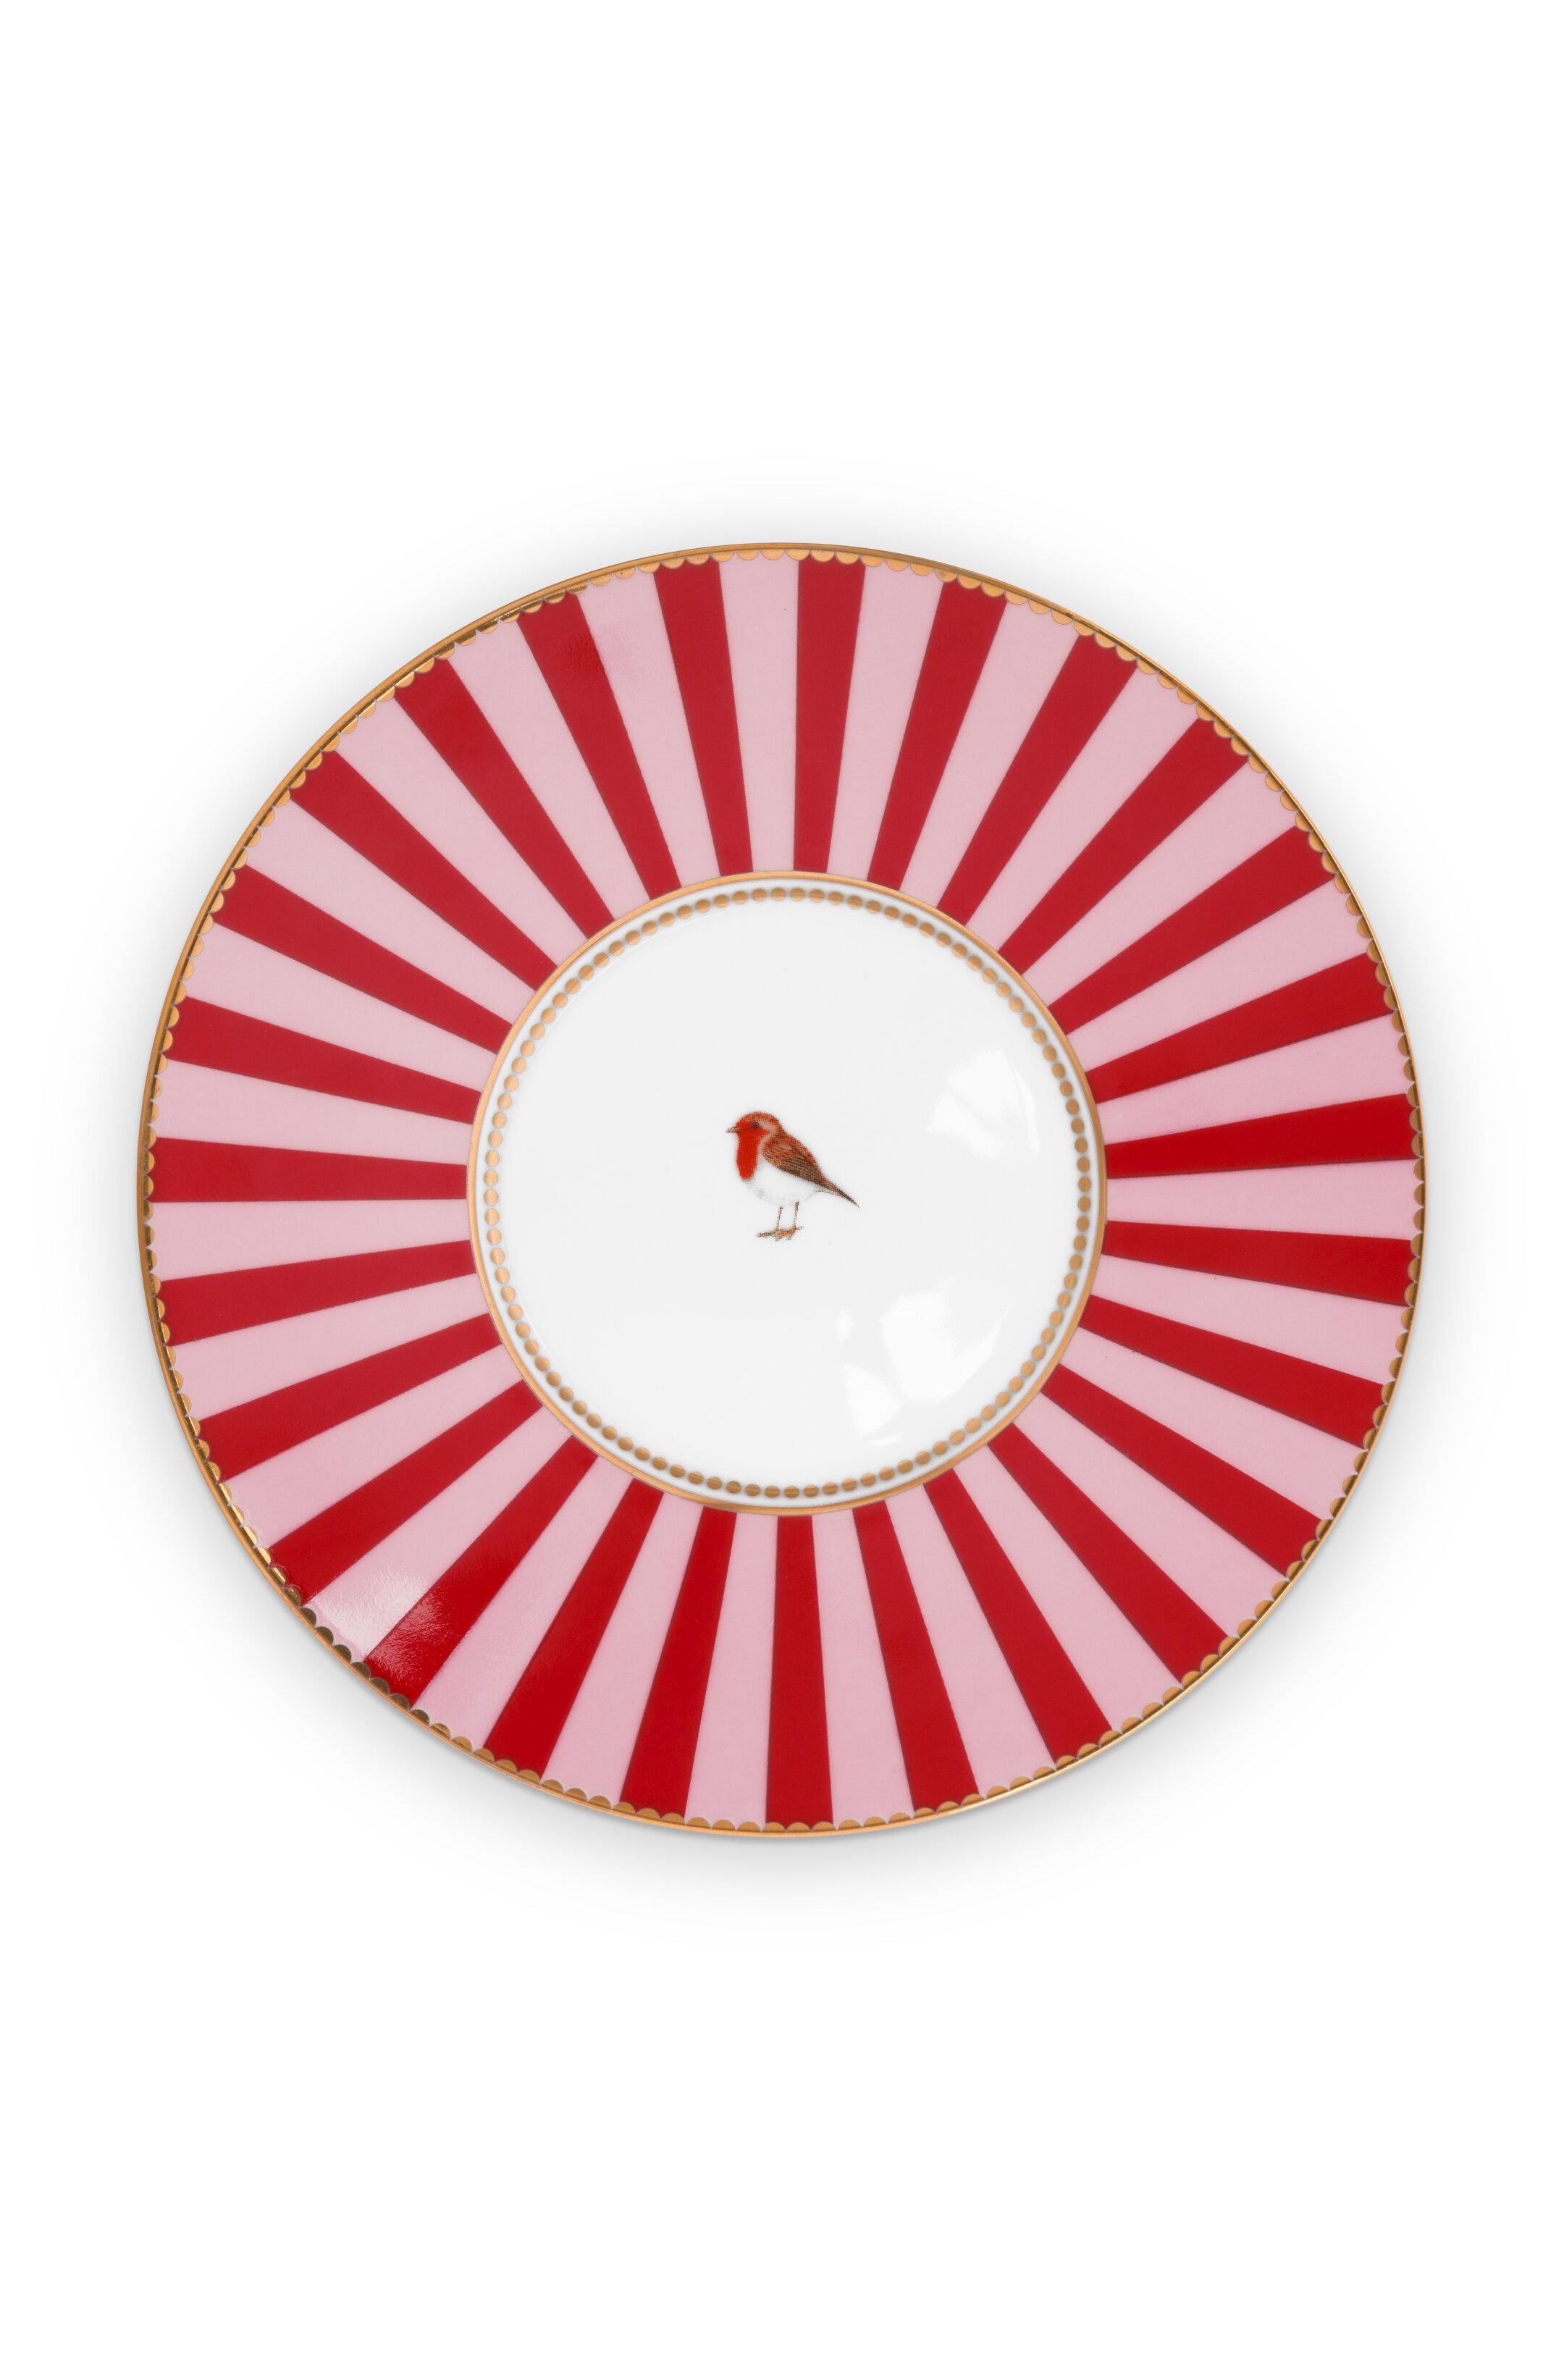 Pip Studio Love Birds Tasse & Untertasse Medaillon Red-Pink